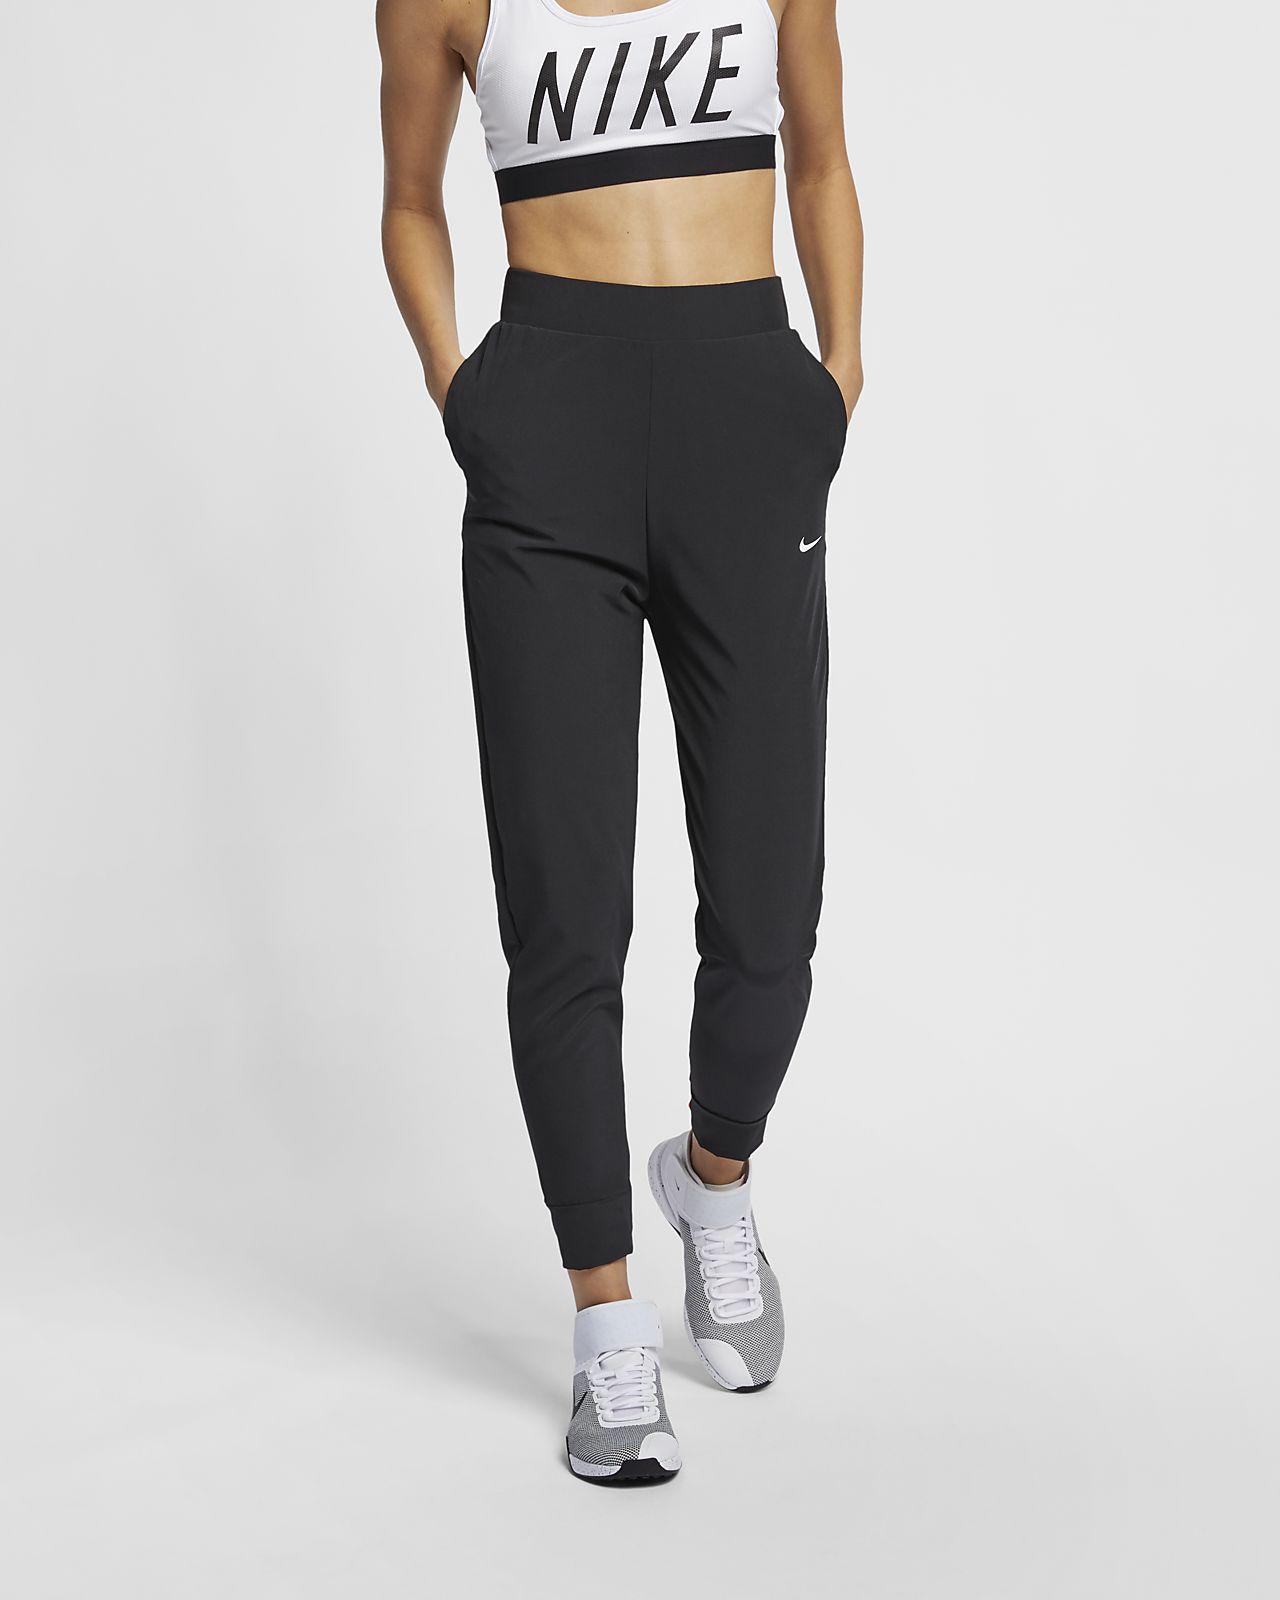 Nike Bliss Women's Training Pants